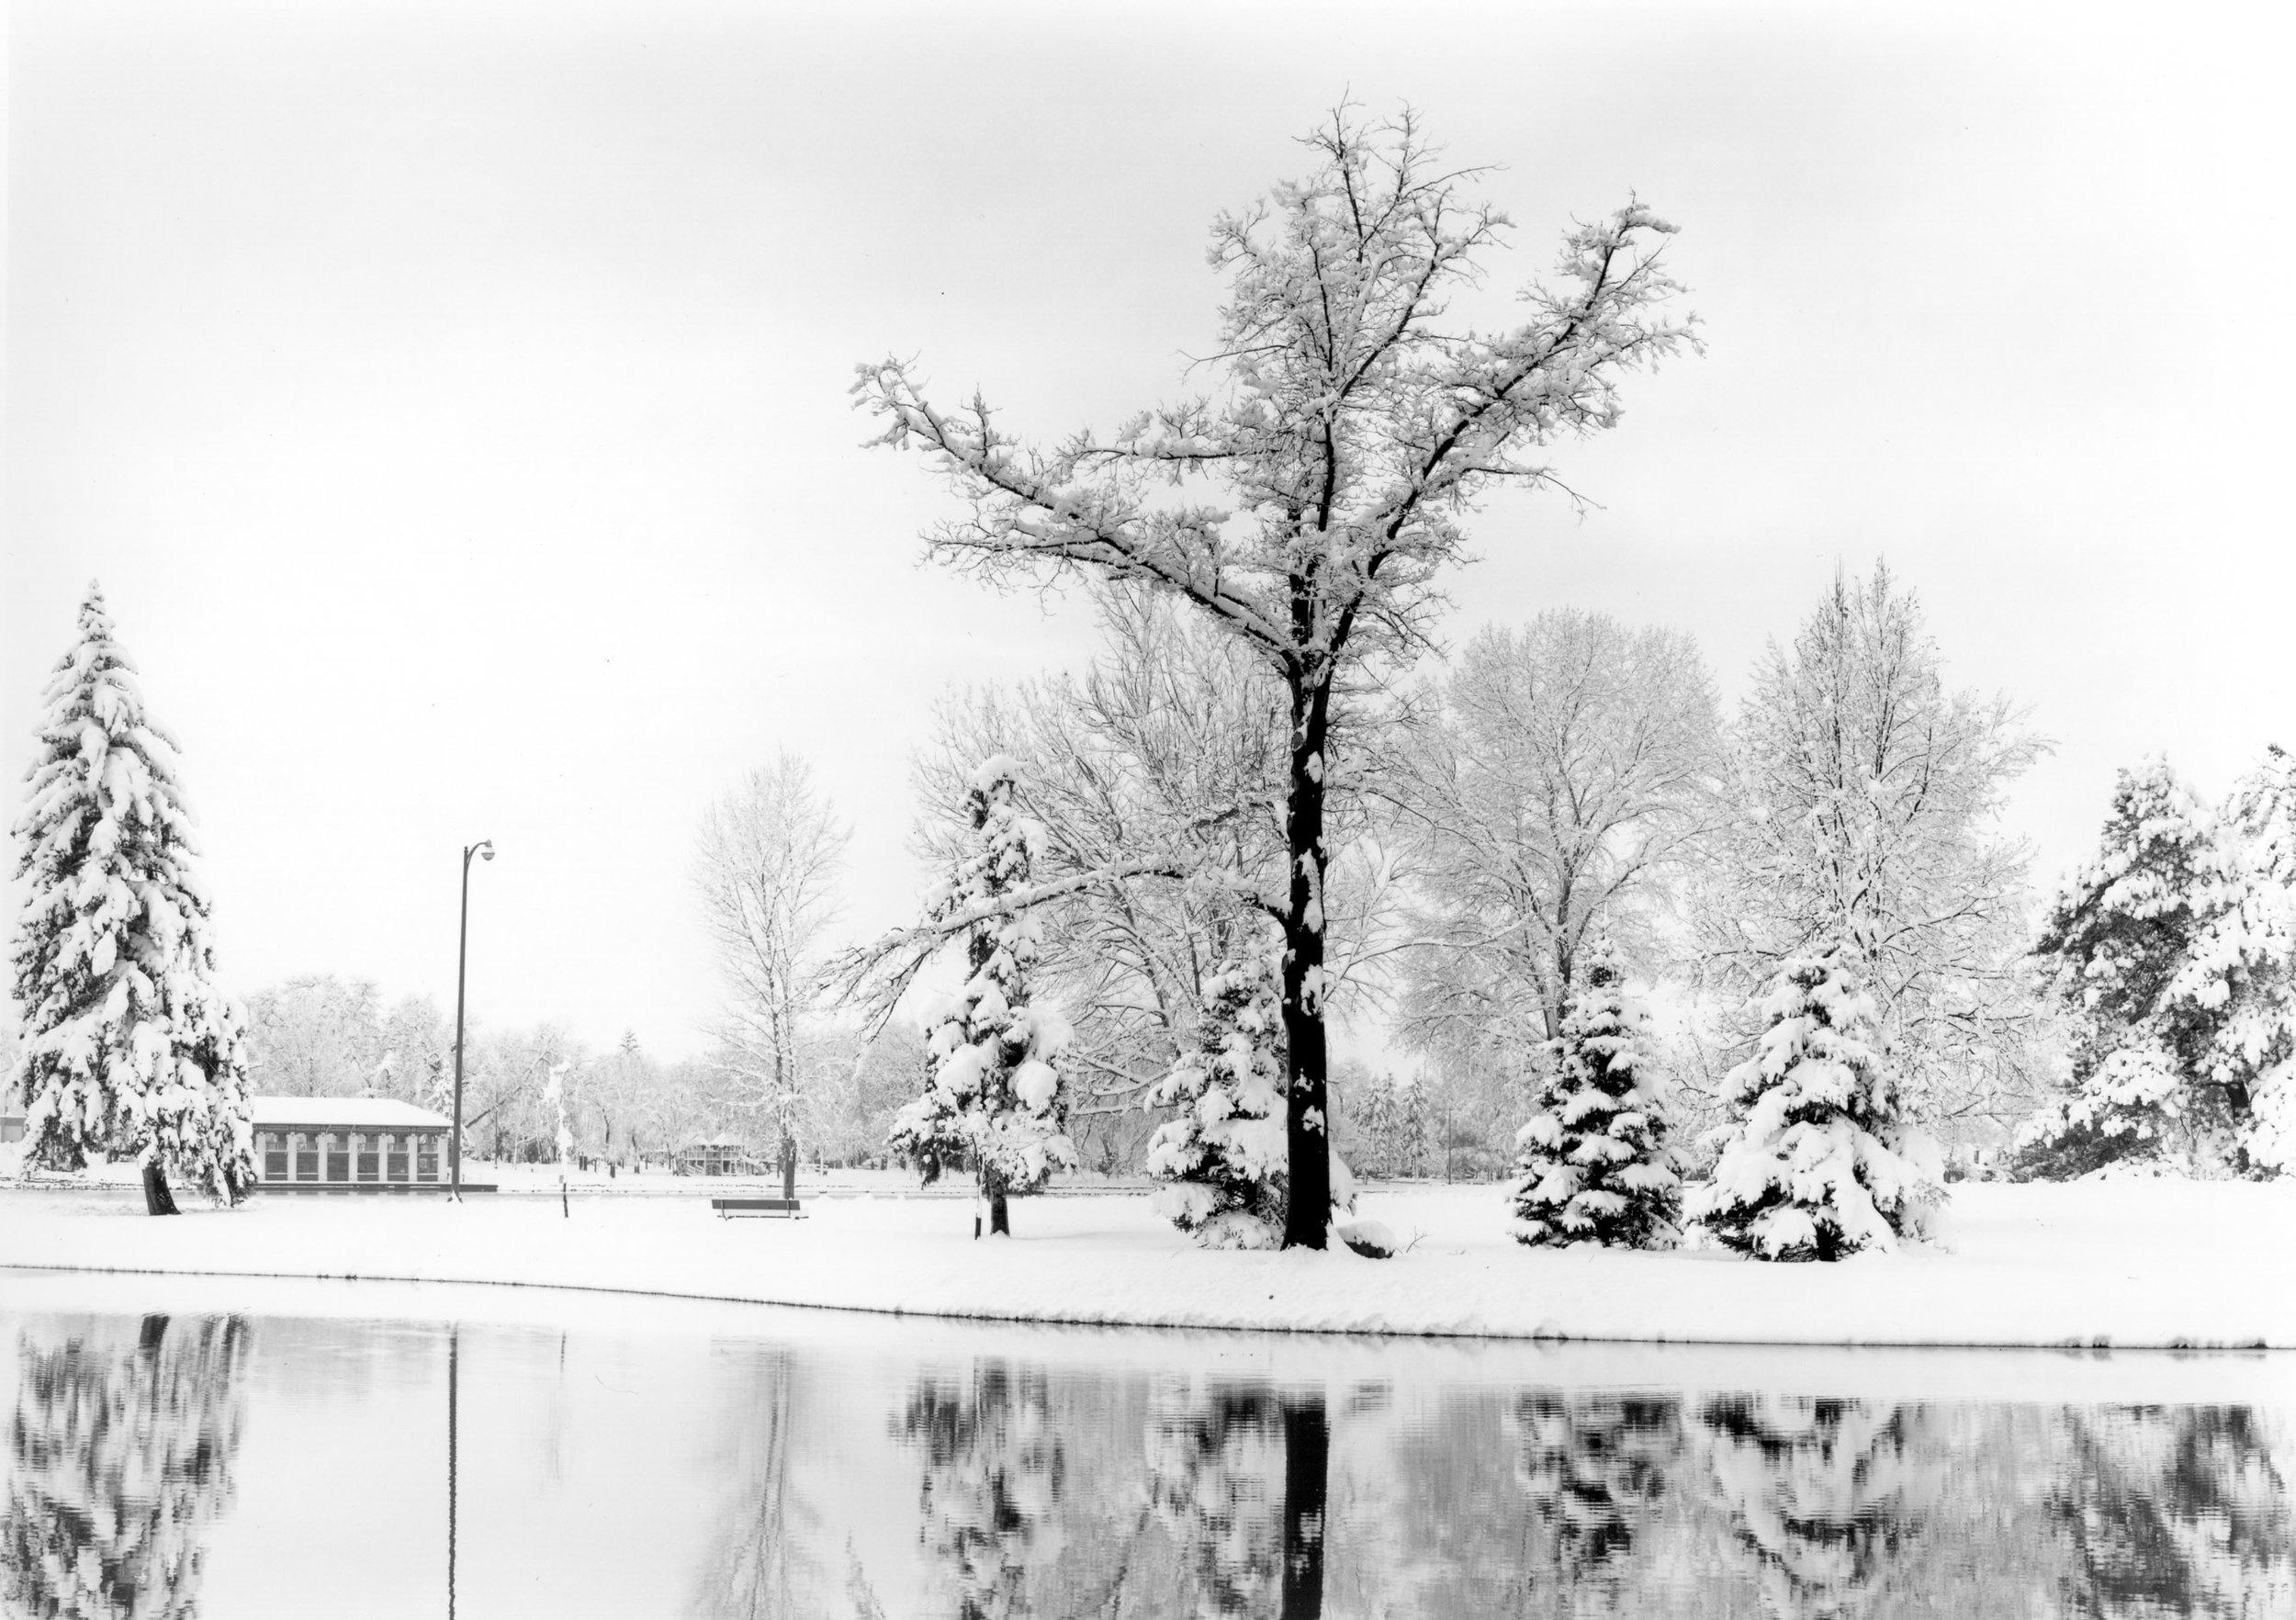 Elm Tree & Boathouse, Washington Park Denver, Colorado